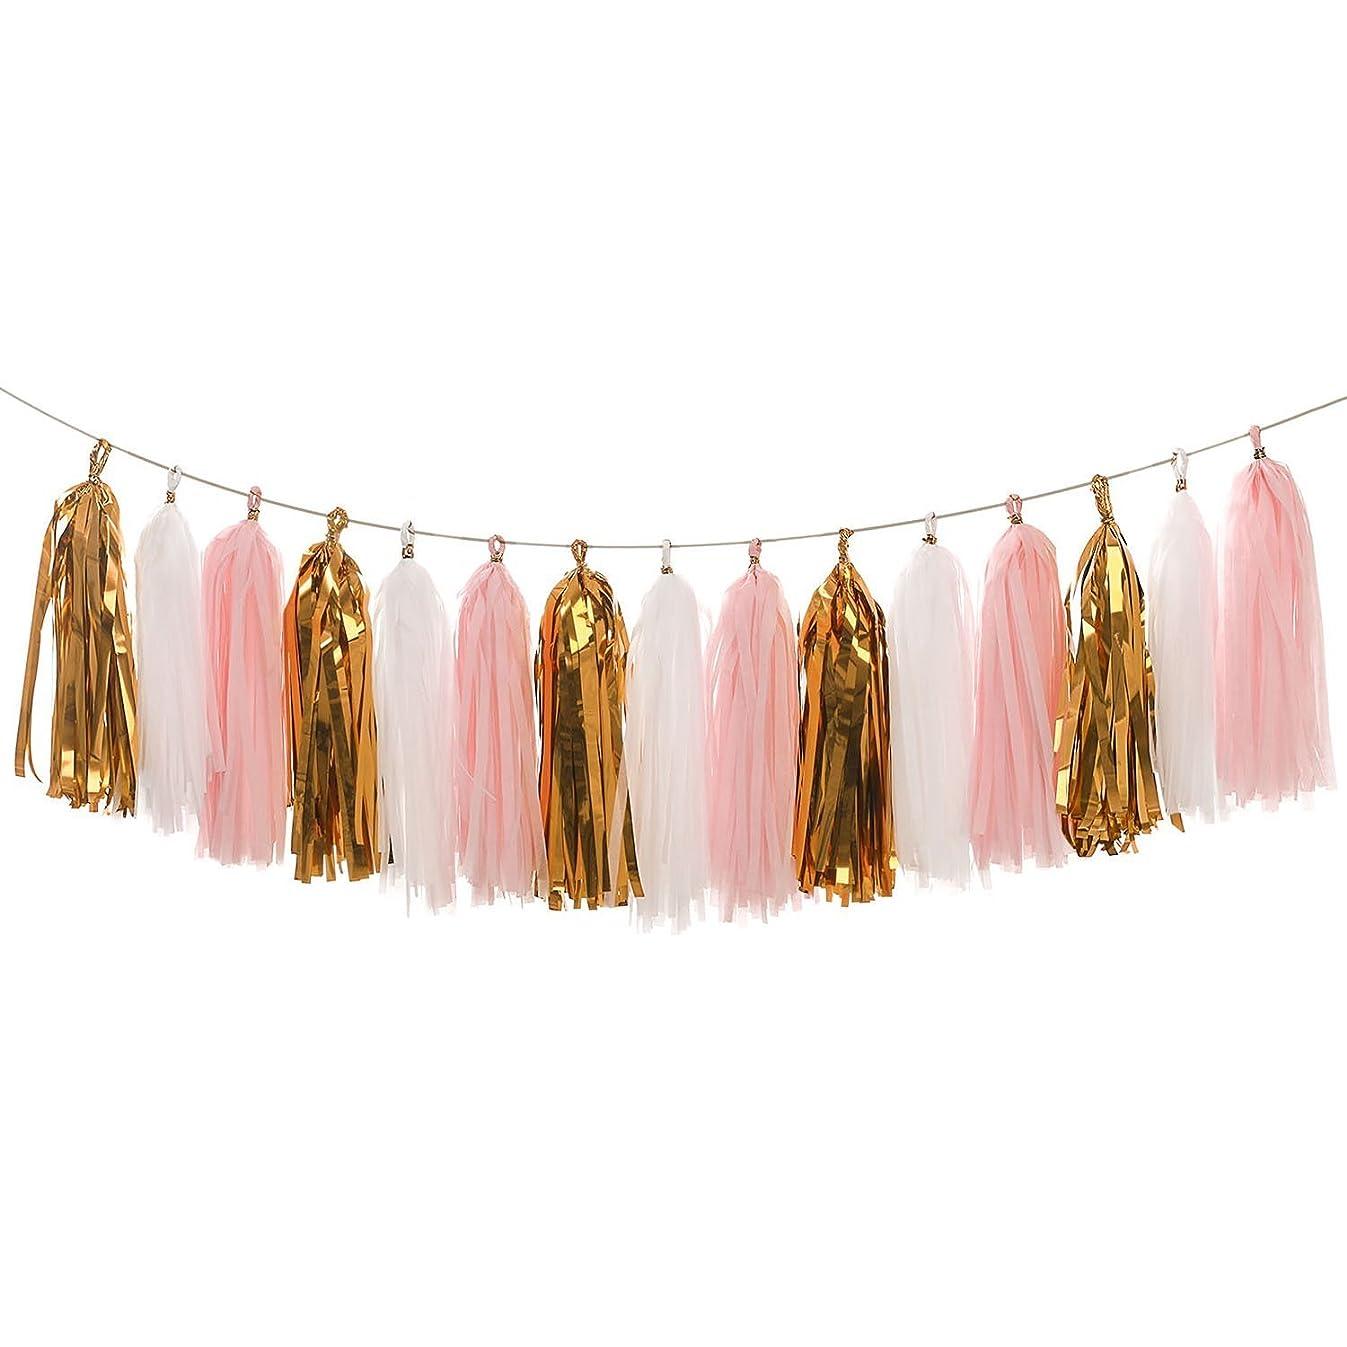 Derhom Tissue Paper Tassel Garland - 20pcs Tassels Per Package - 12 Inch Long Tassels (Gold/Pink)